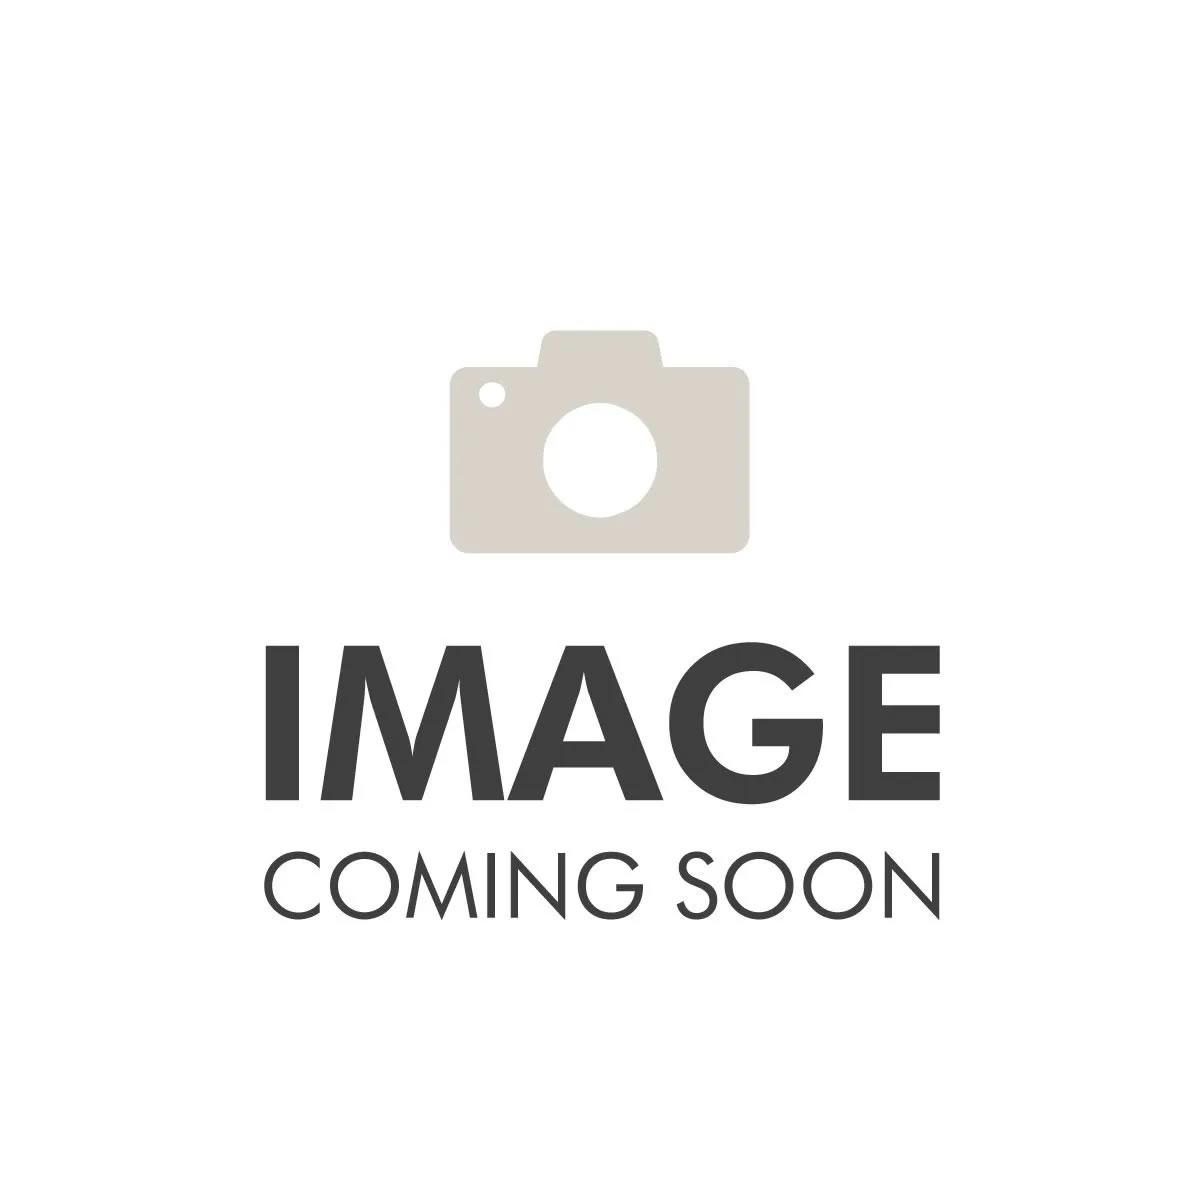 Floor Liners, Rear, Tan; 07-13 Silverado/Sierra 1500 Extended